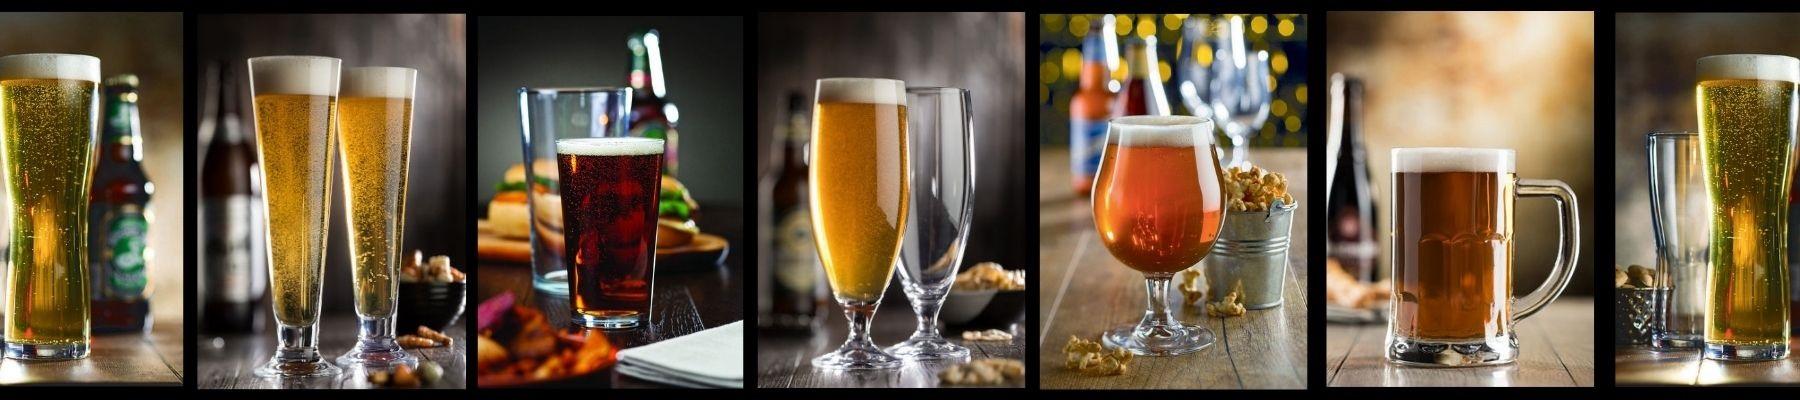 Utopia Beer Glasses